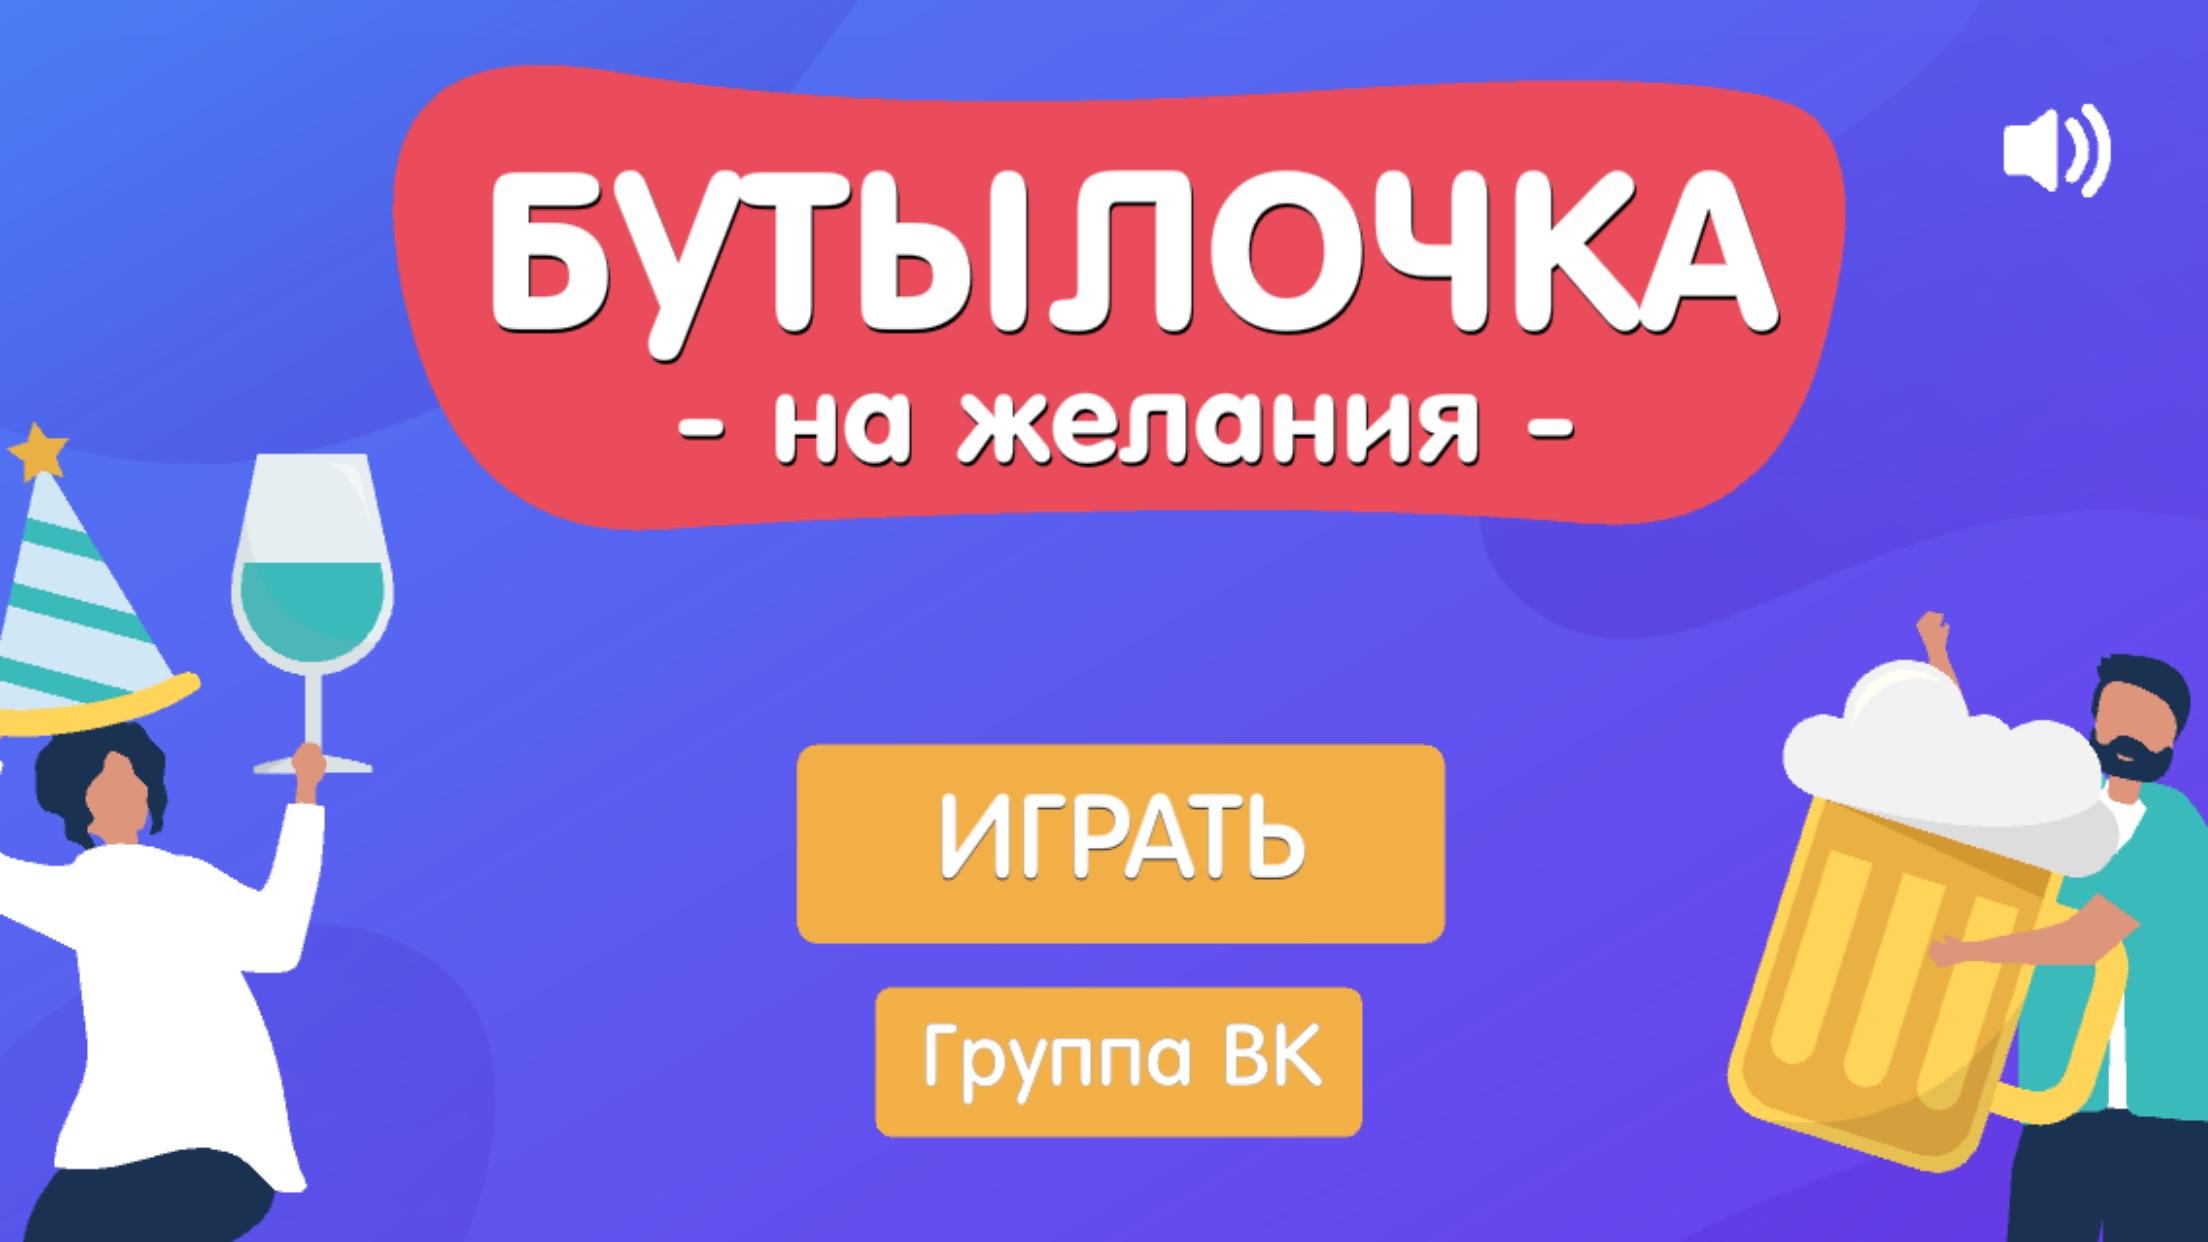 Бутылочка с заданиями Screenshot